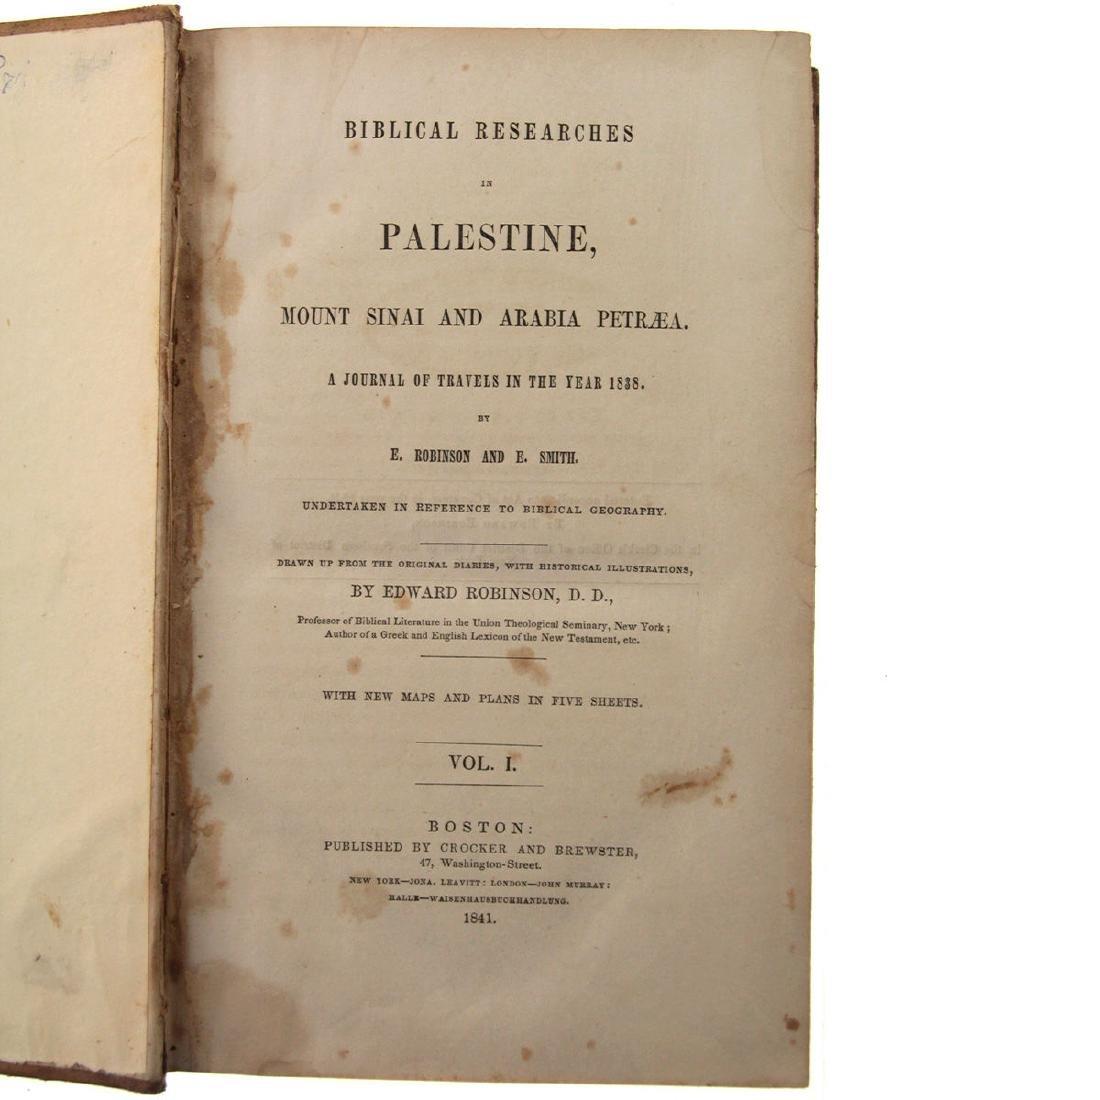 Biblical Researches in Palestine, Edward Robinson, - 5